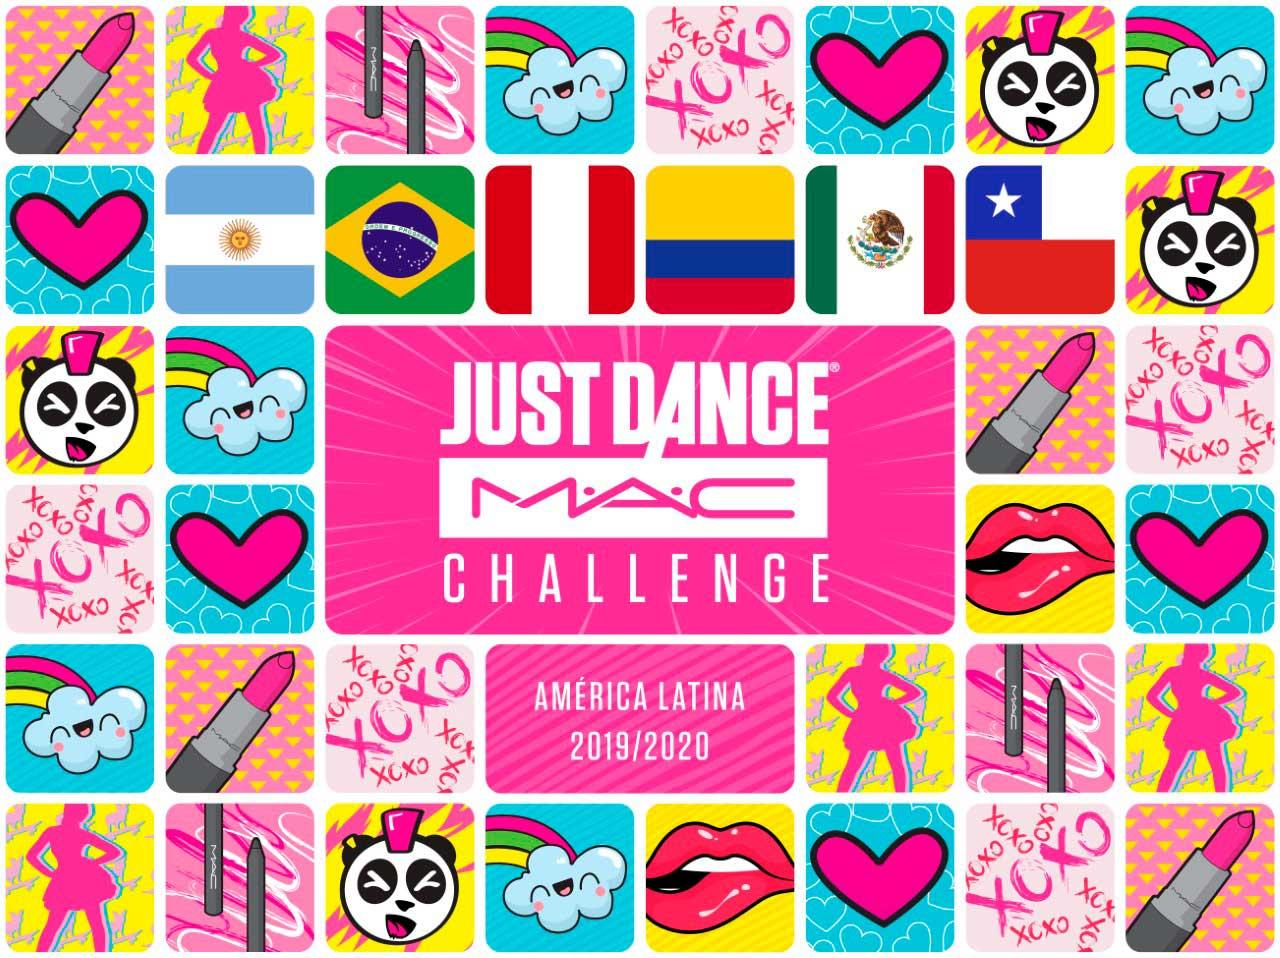 Just Dance M.A.C Challenge